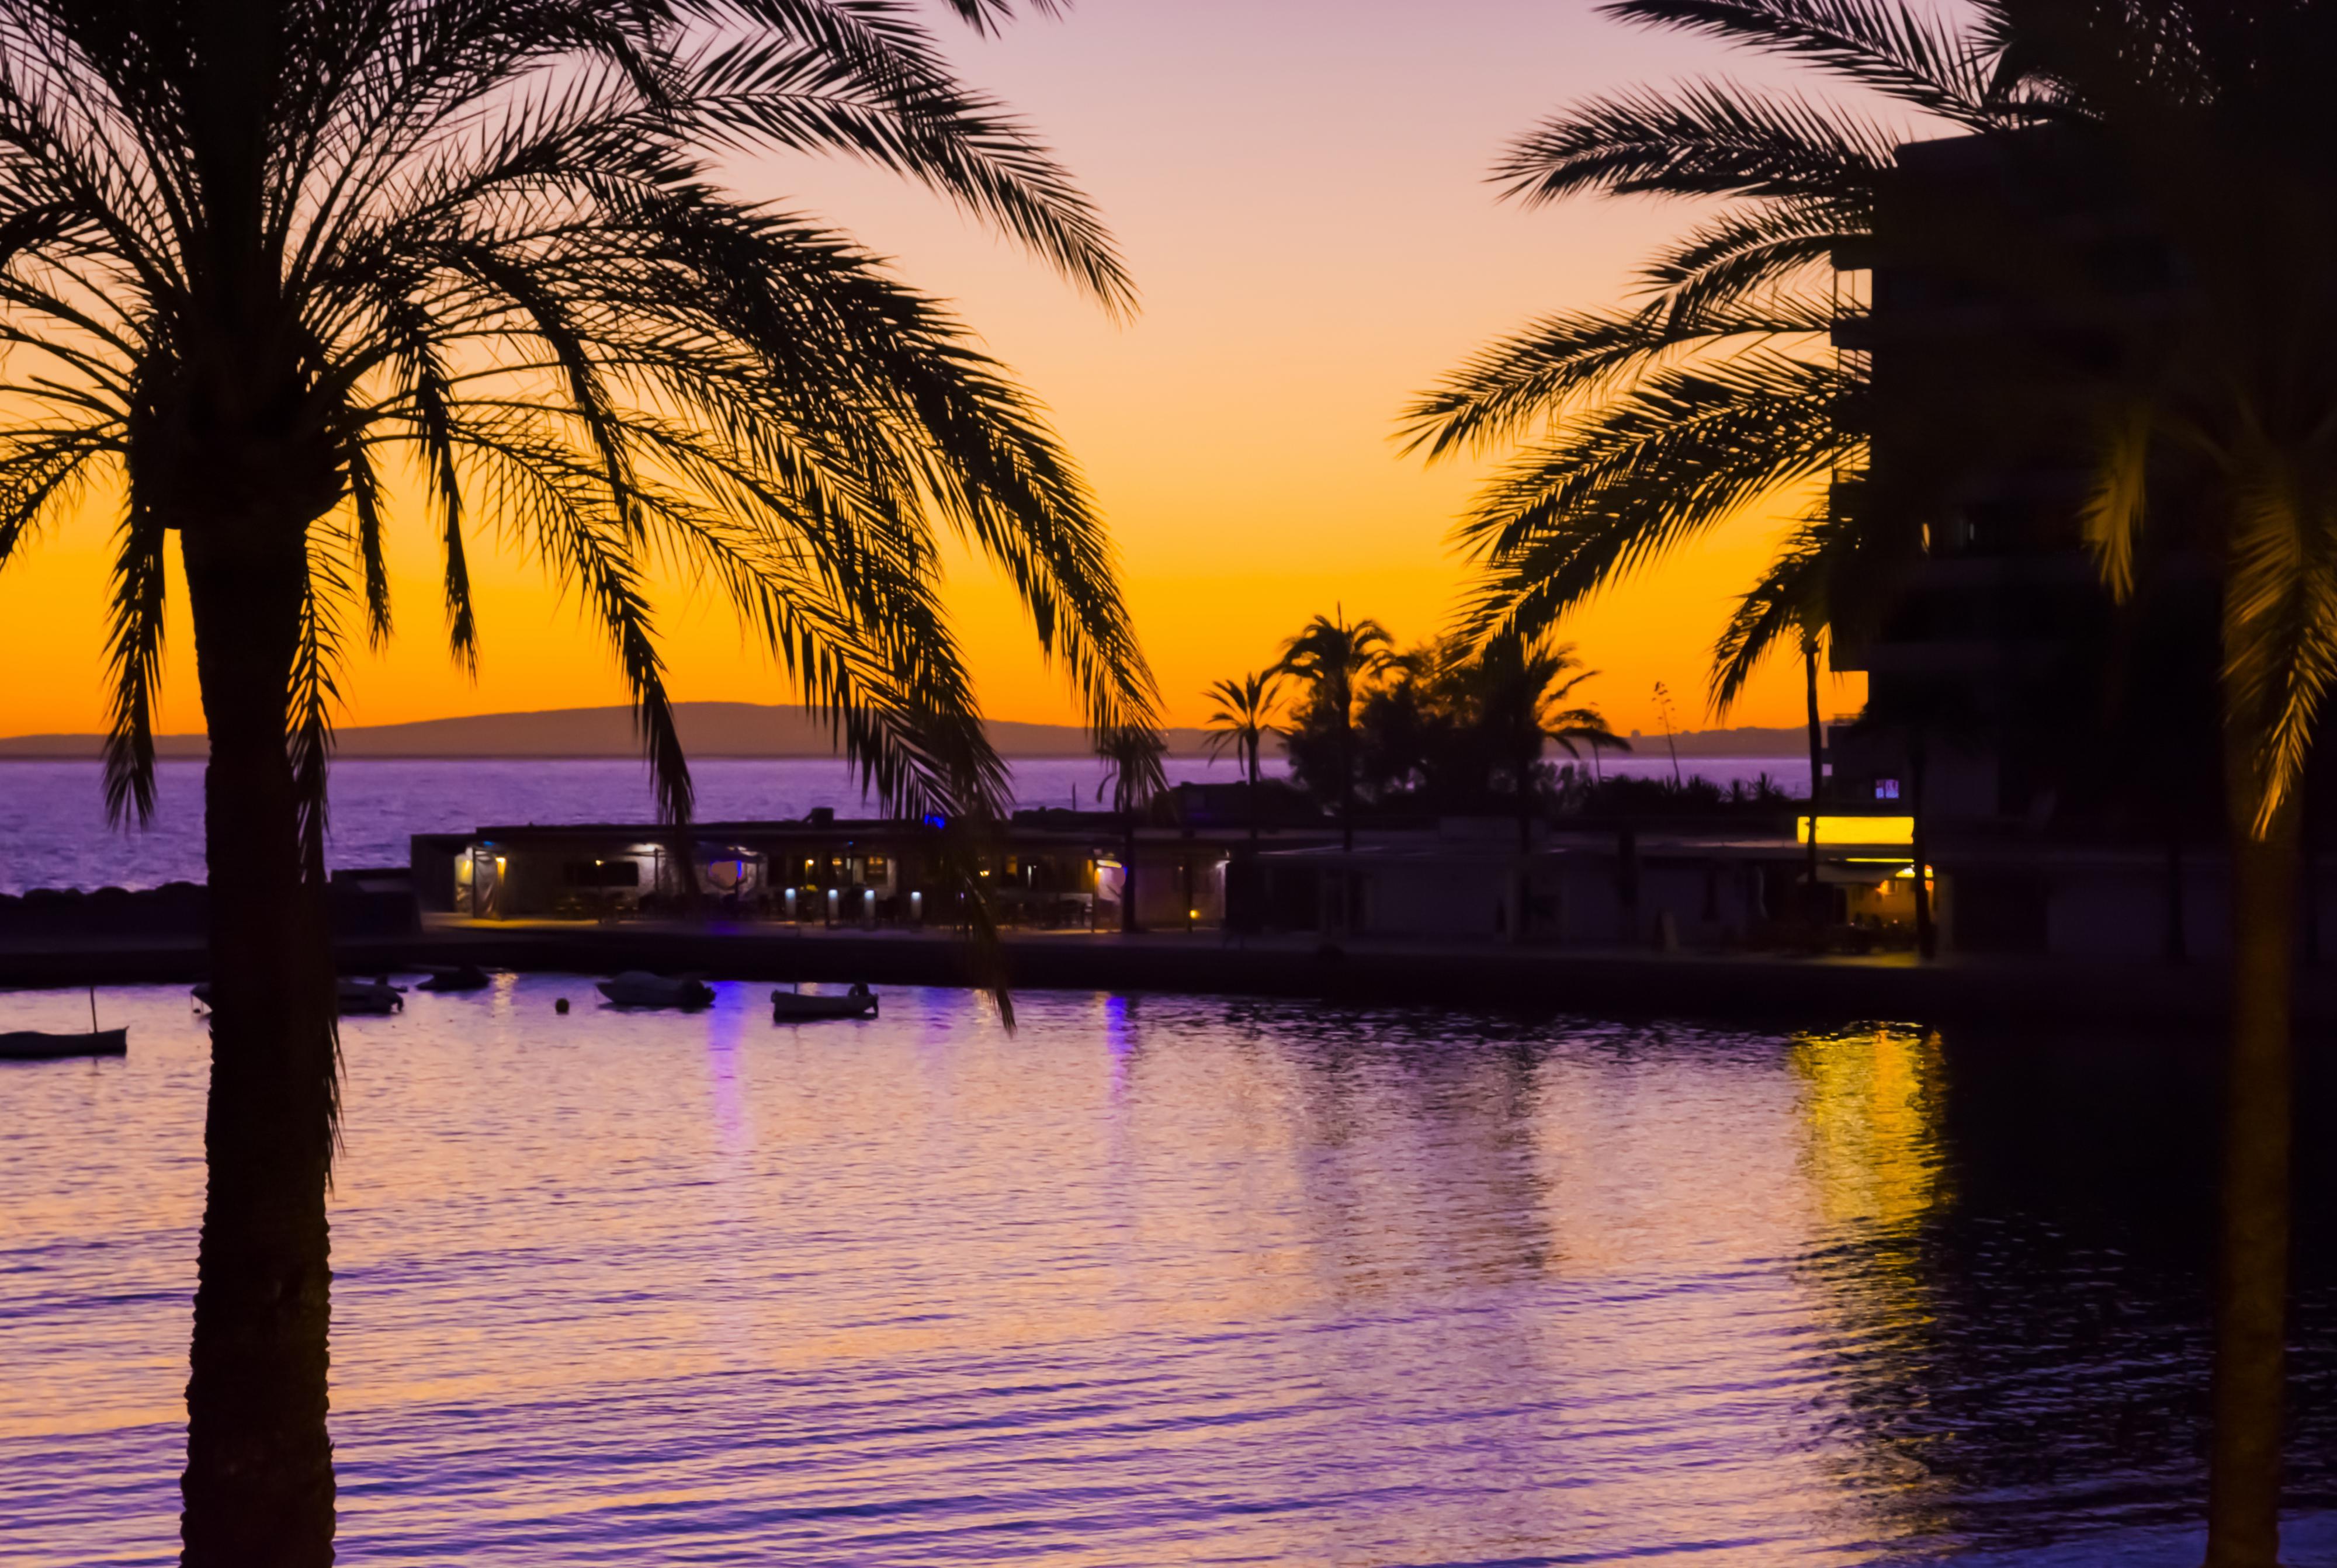 Mallorca is van ons!: realityserie op de Metro-app